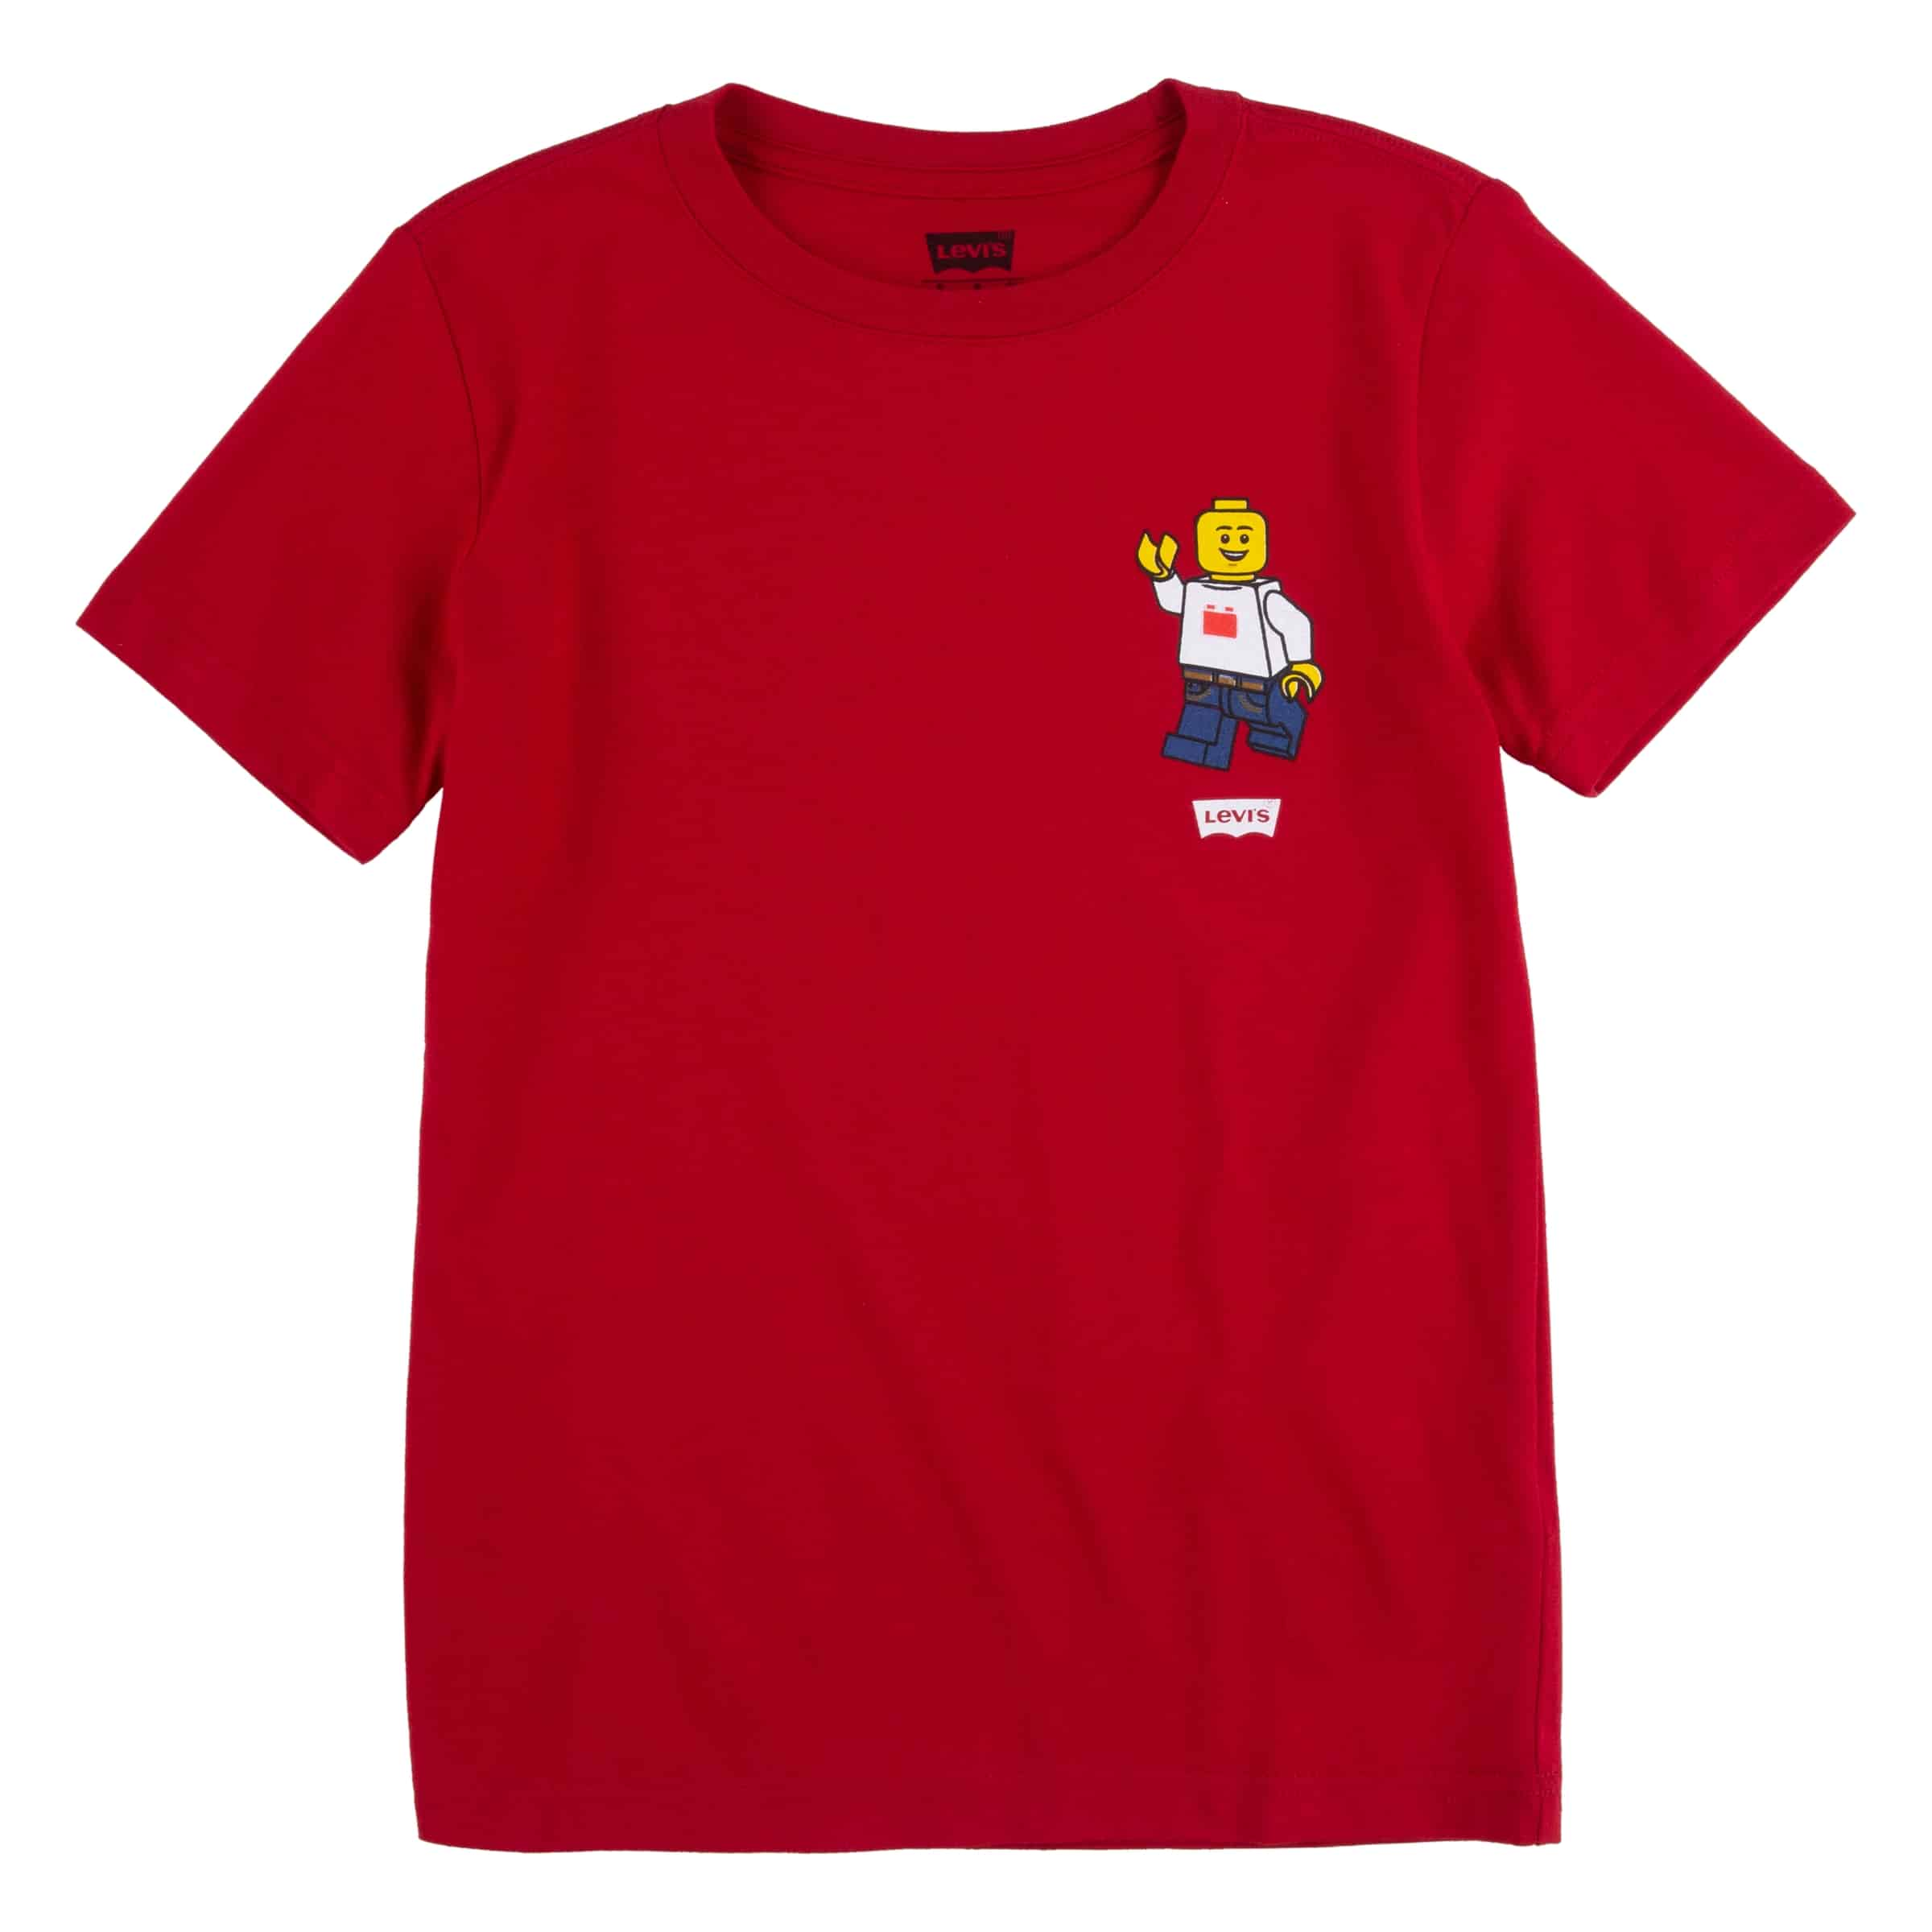 levis x lego 5006407 logo t shirt 4 7